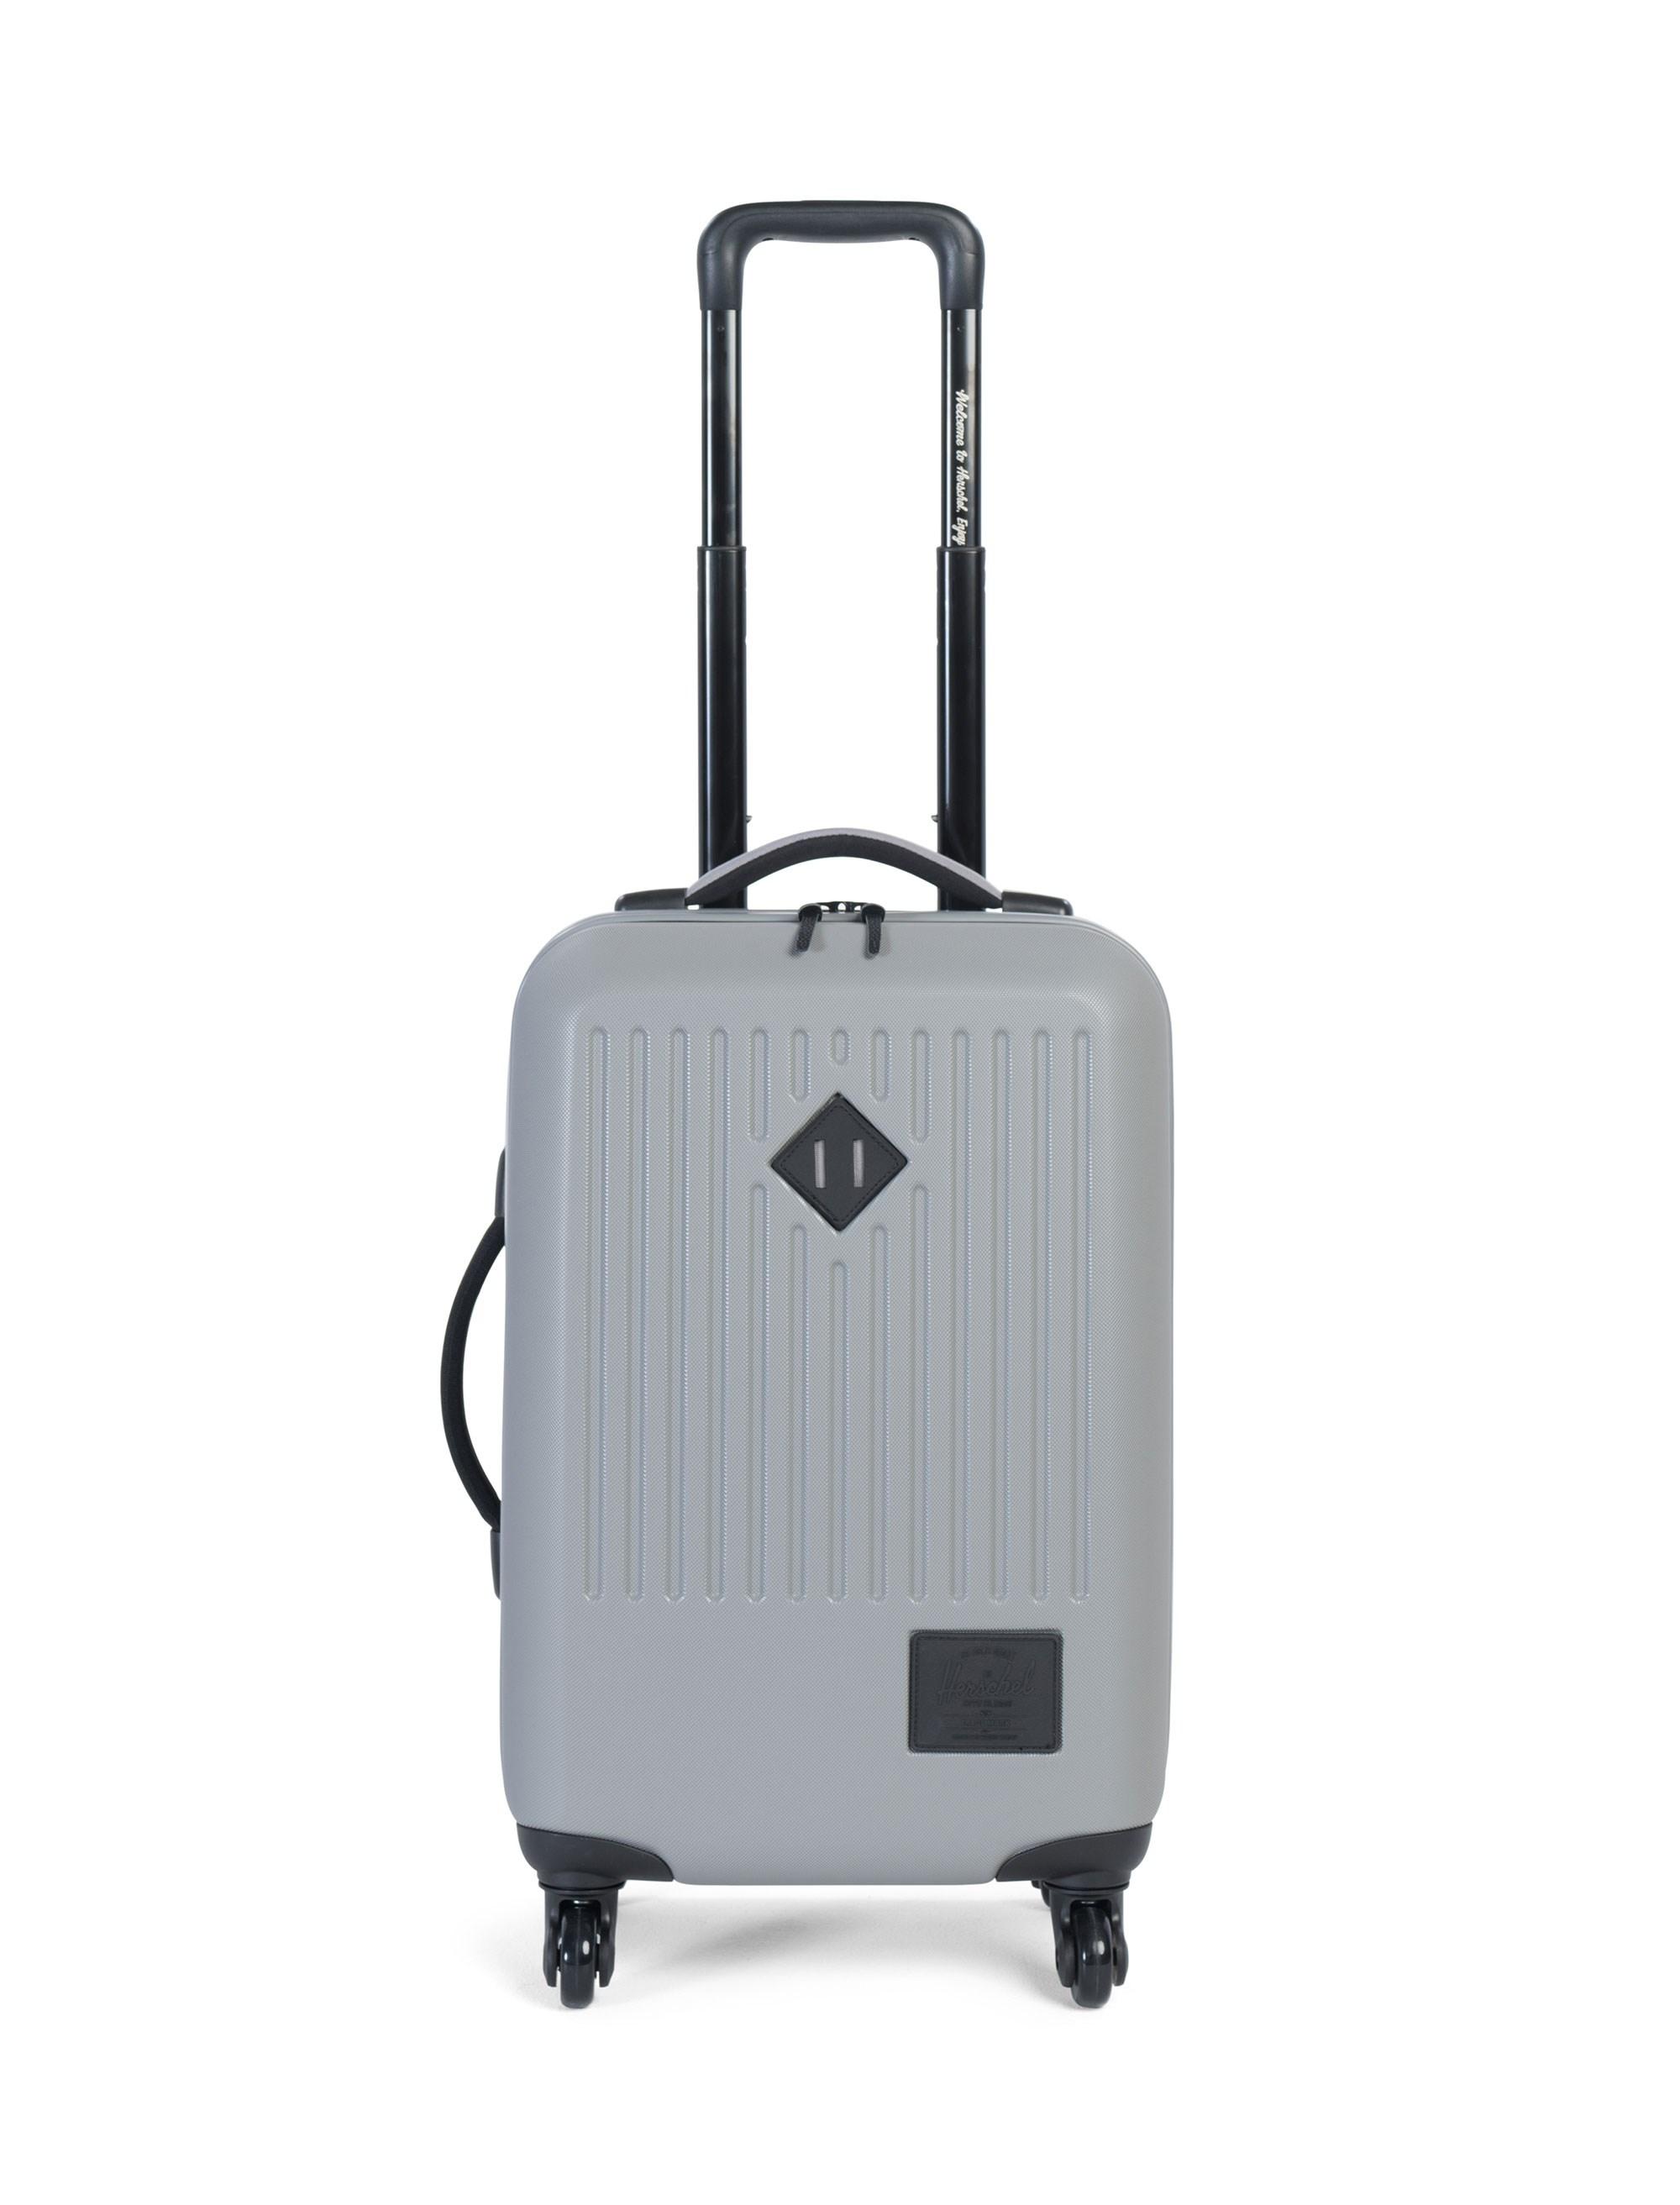 چمدان Trade Small - هرشل - طوسي - 1